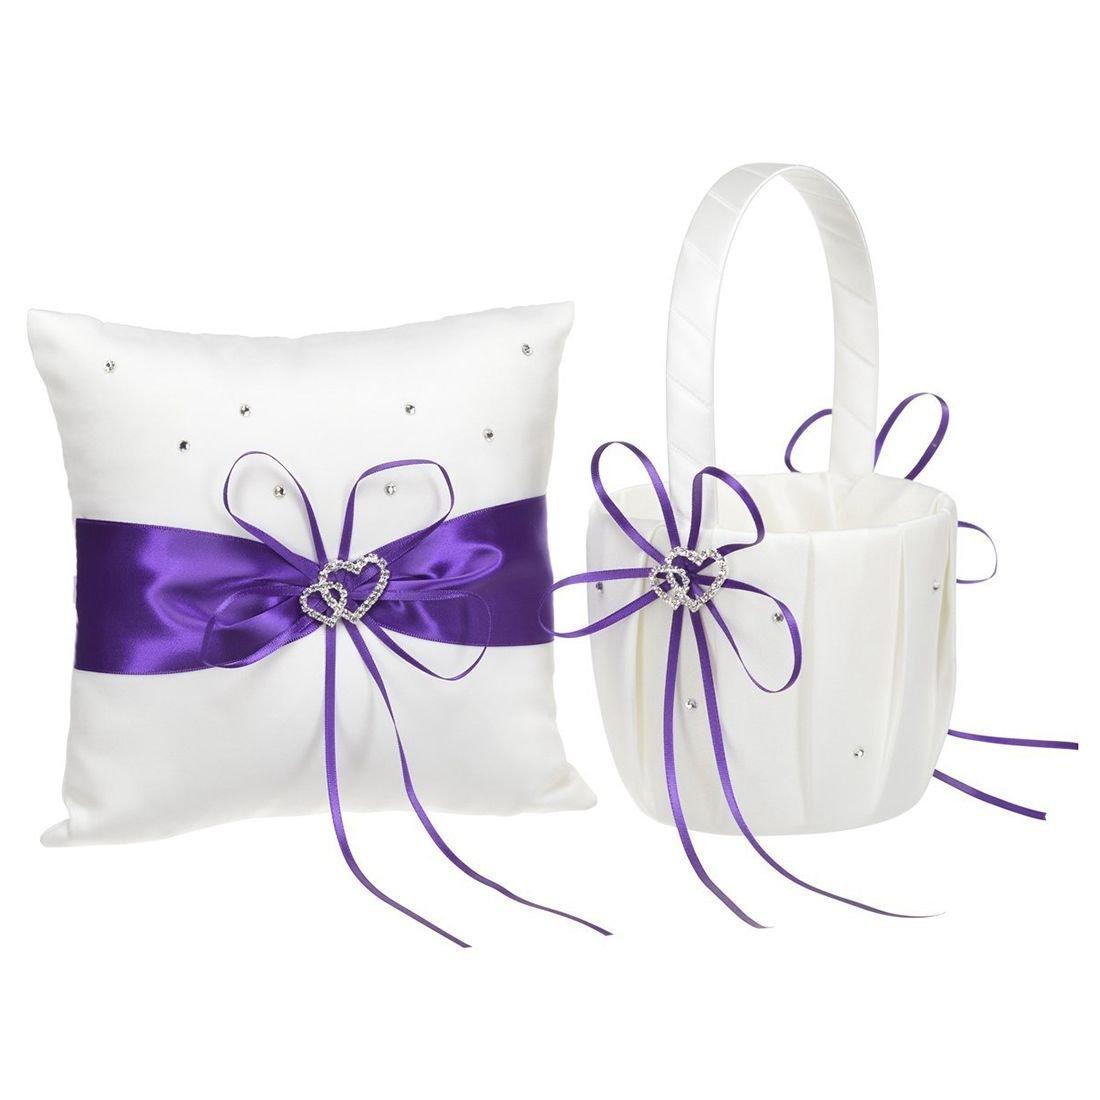 SODIAL(R) 2 Heart Rhinestones Ivory Satin Flower Girl Basket And Ring Pillow Set for Wedding Purple